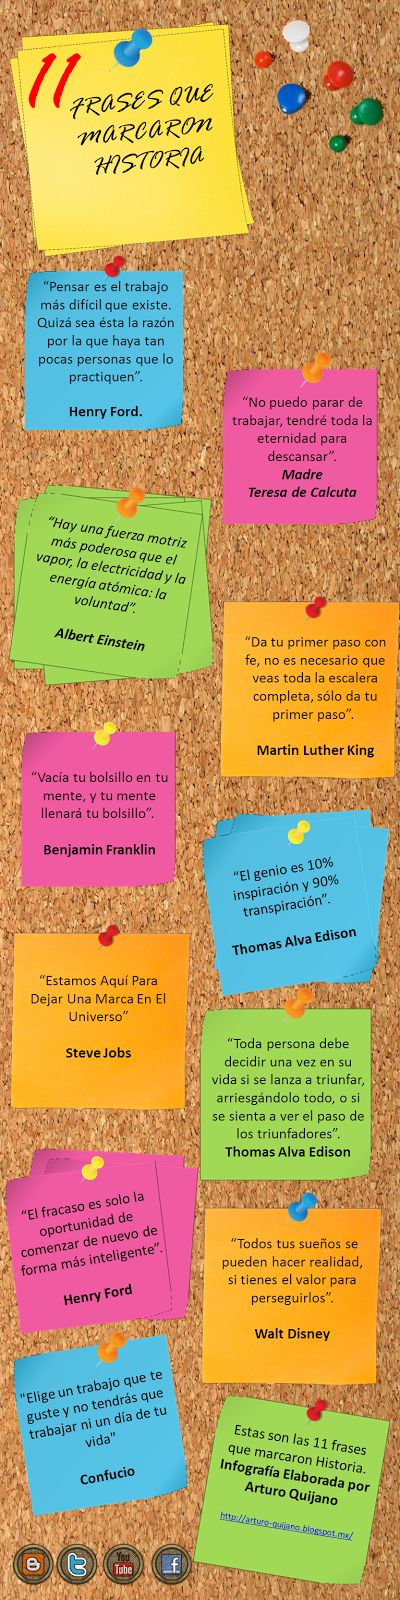 11 frases que hicieron historia #infografia #infographic #citas #quotes